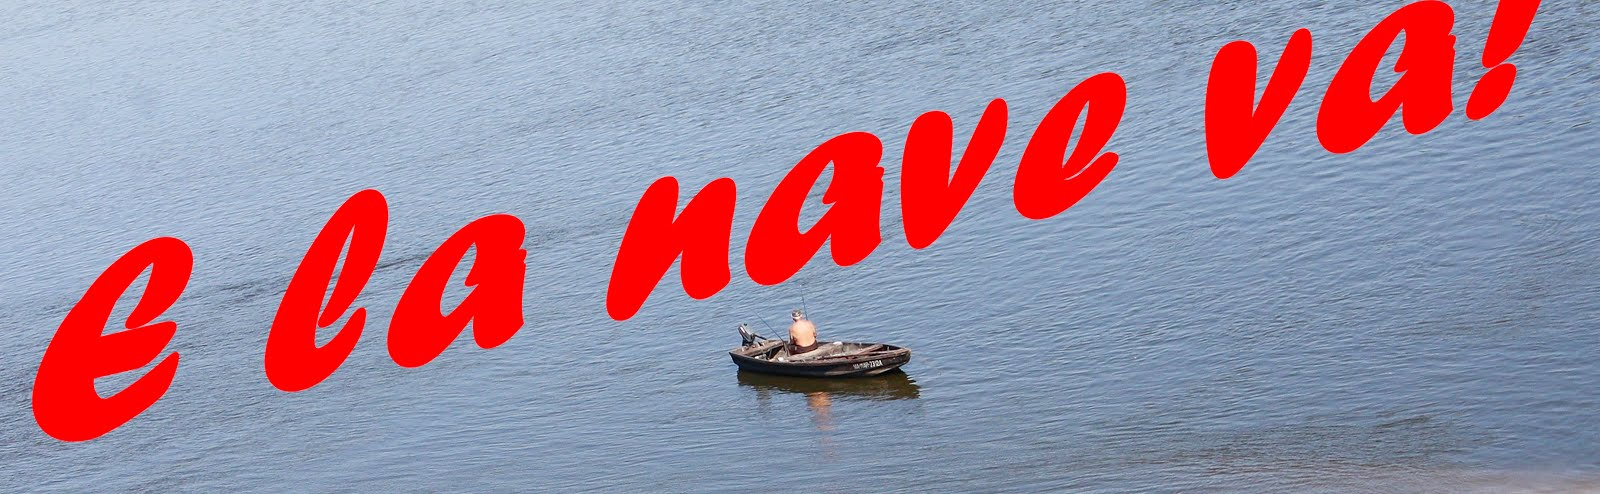 Elanaveva